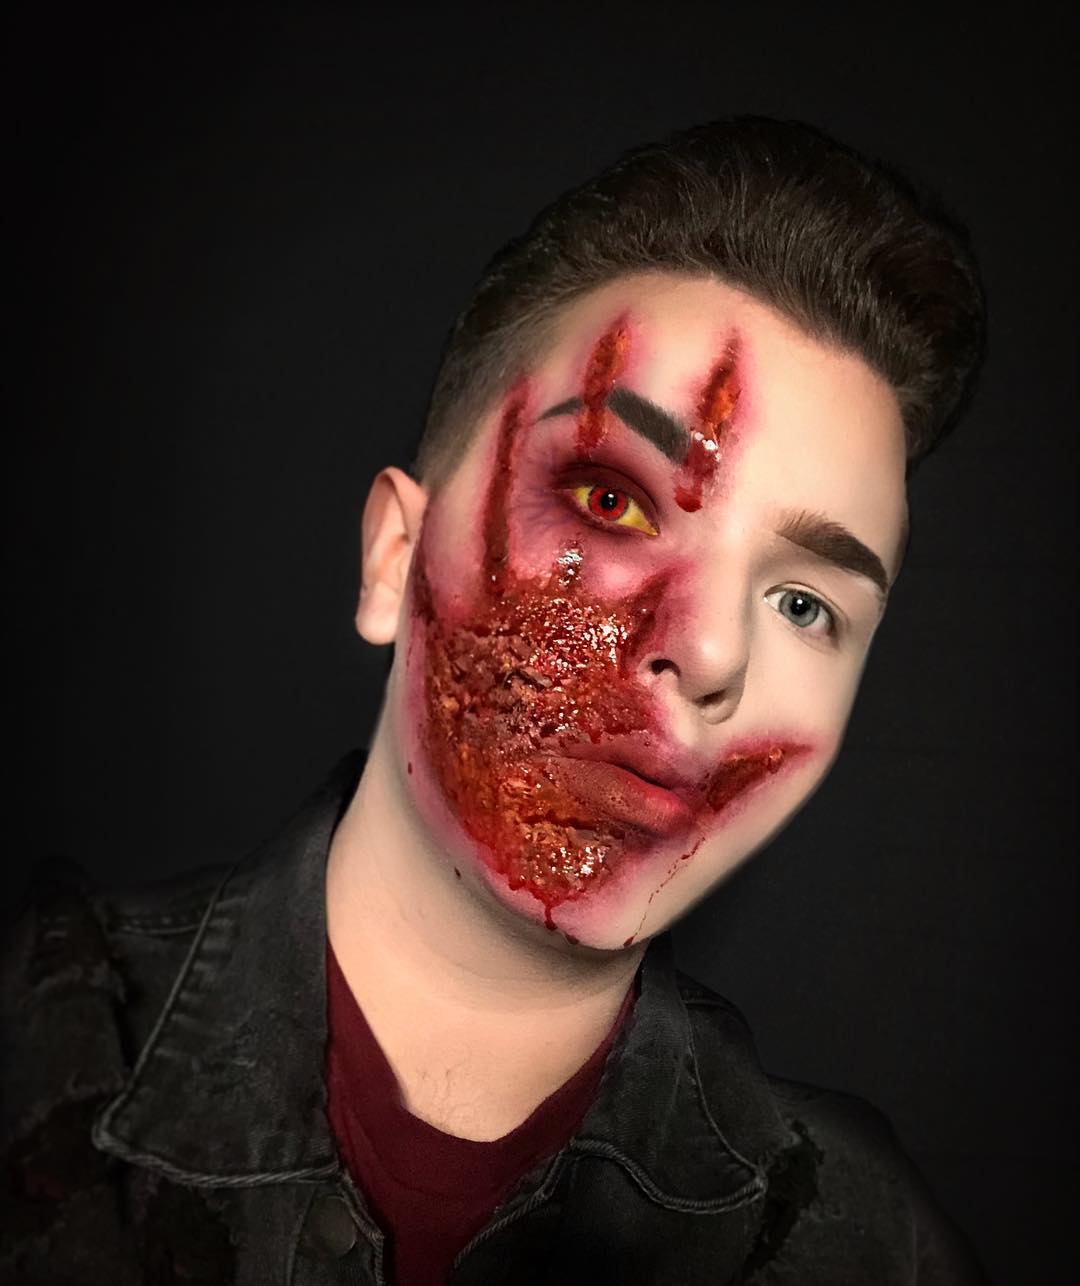 хэллоуин, хэллоуин 2018, хэллоуин фото, хэллоуин макияж рис 10